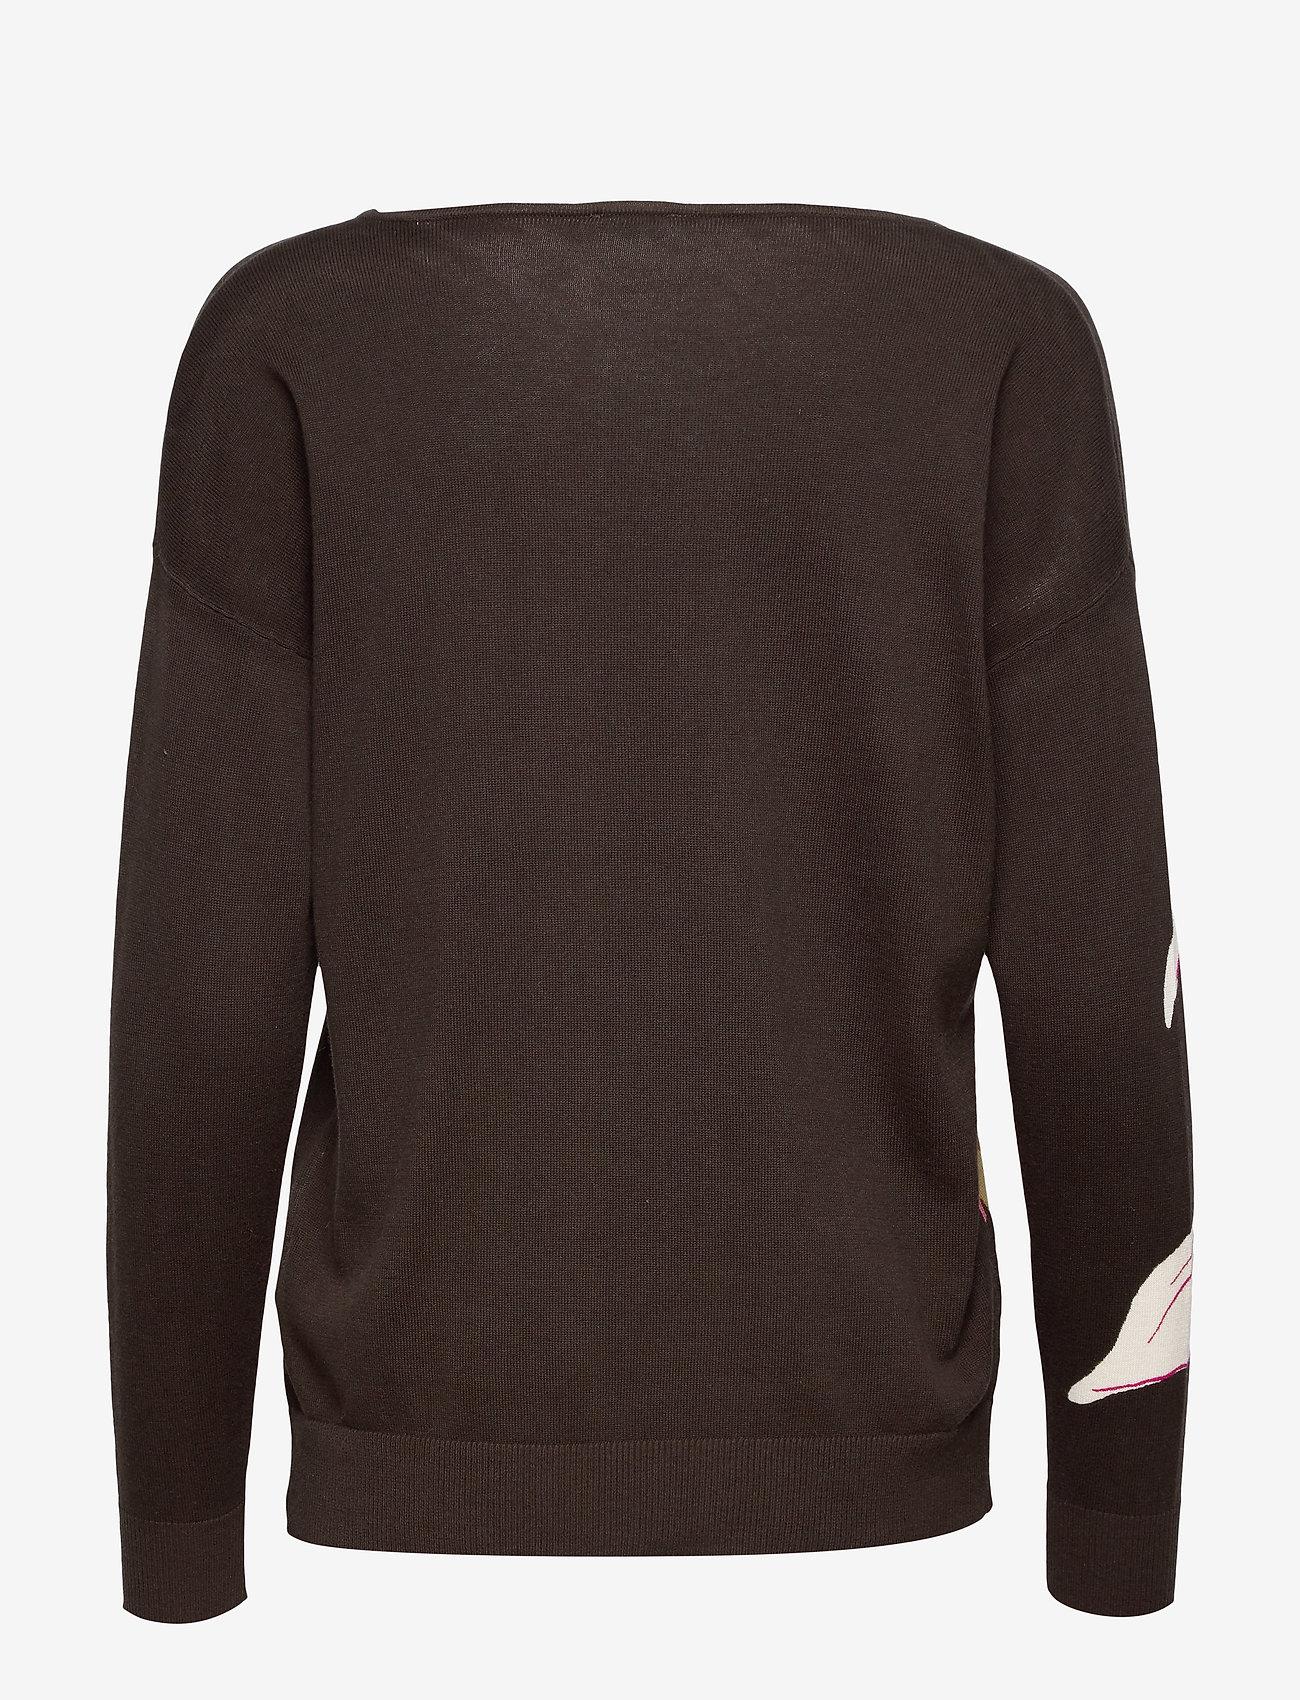 Pullover Long-sleeve (Choclate/ Pink/ Ecru Print) (604.45 kr) - Gerry Weber